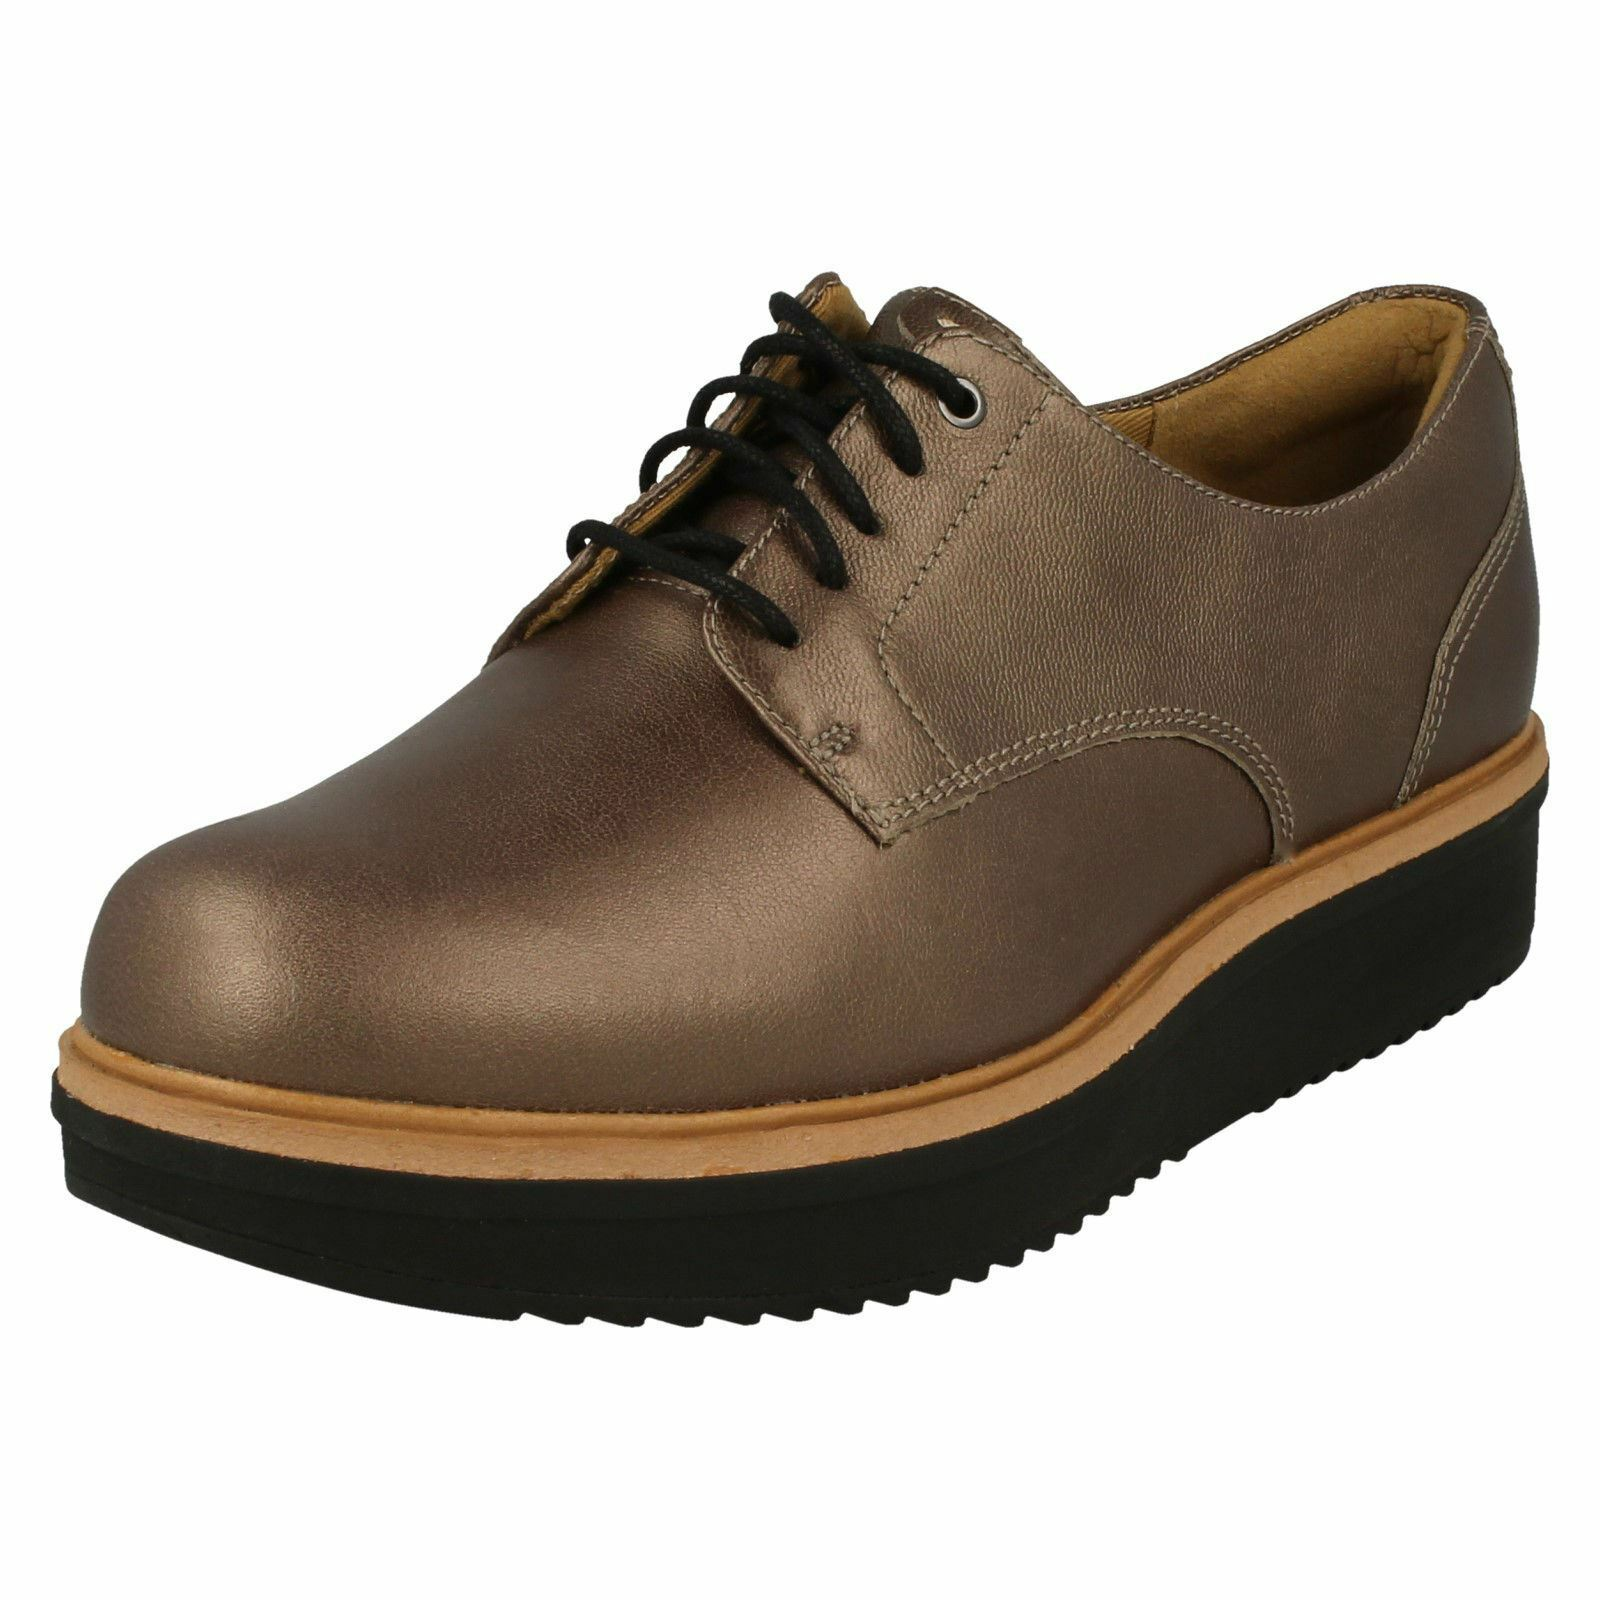 Clarks Ladies Brogue Brogue Brogue Style shoes Teadale Rhea d4b34f